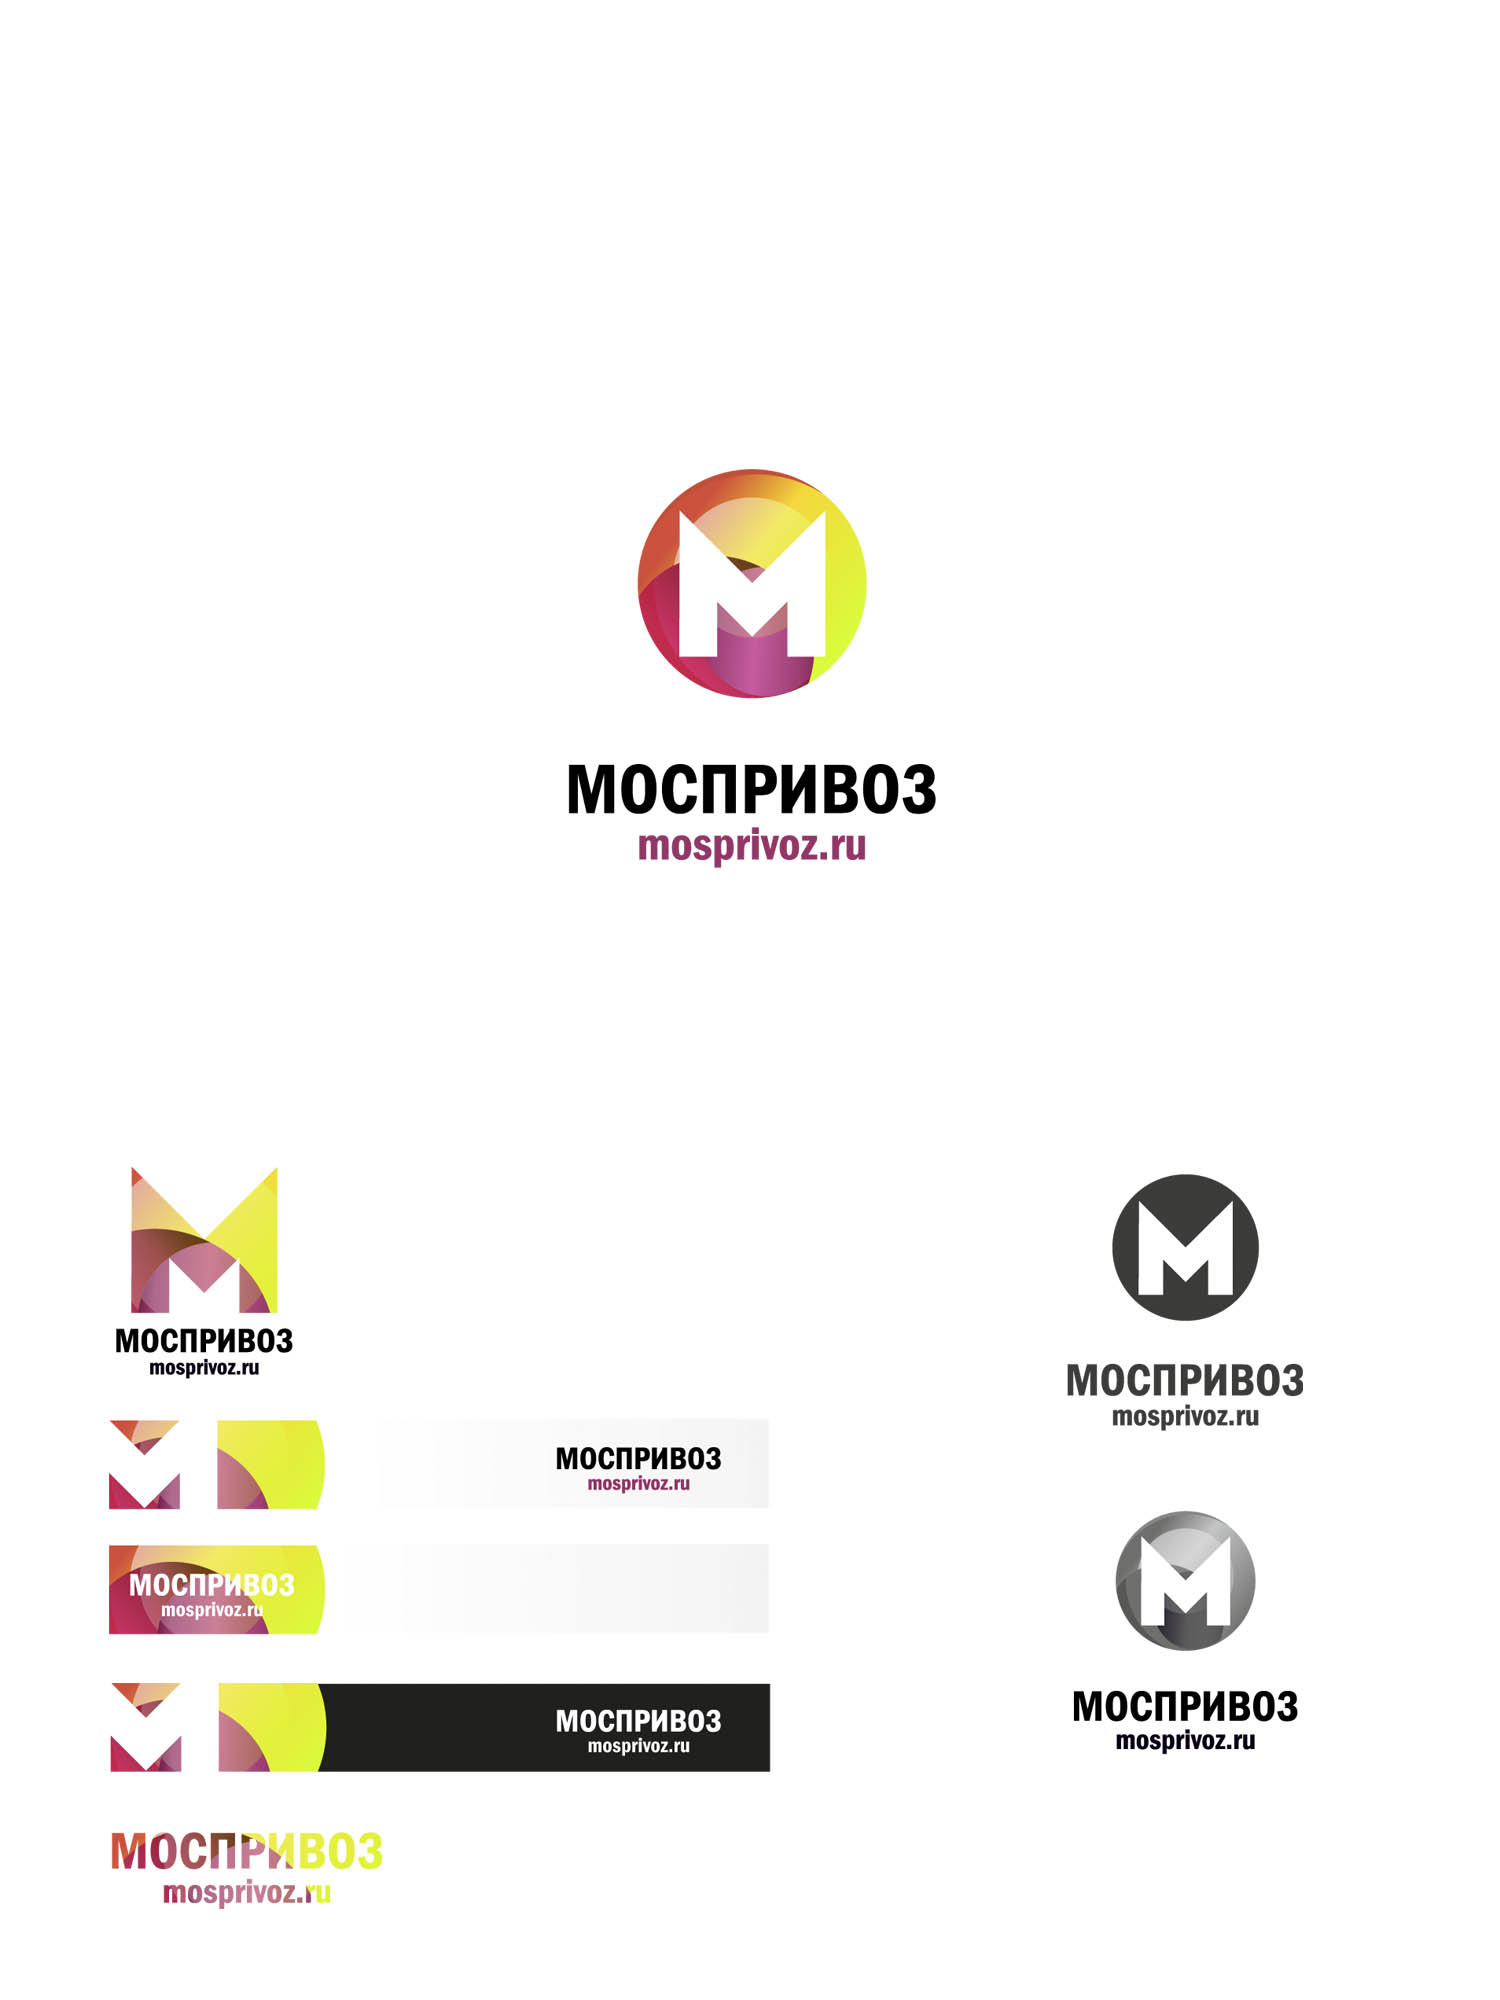 Логотип. Интернет - магазин по доставке продуктов питания. фото f_5025ad9198ceee41.jpg